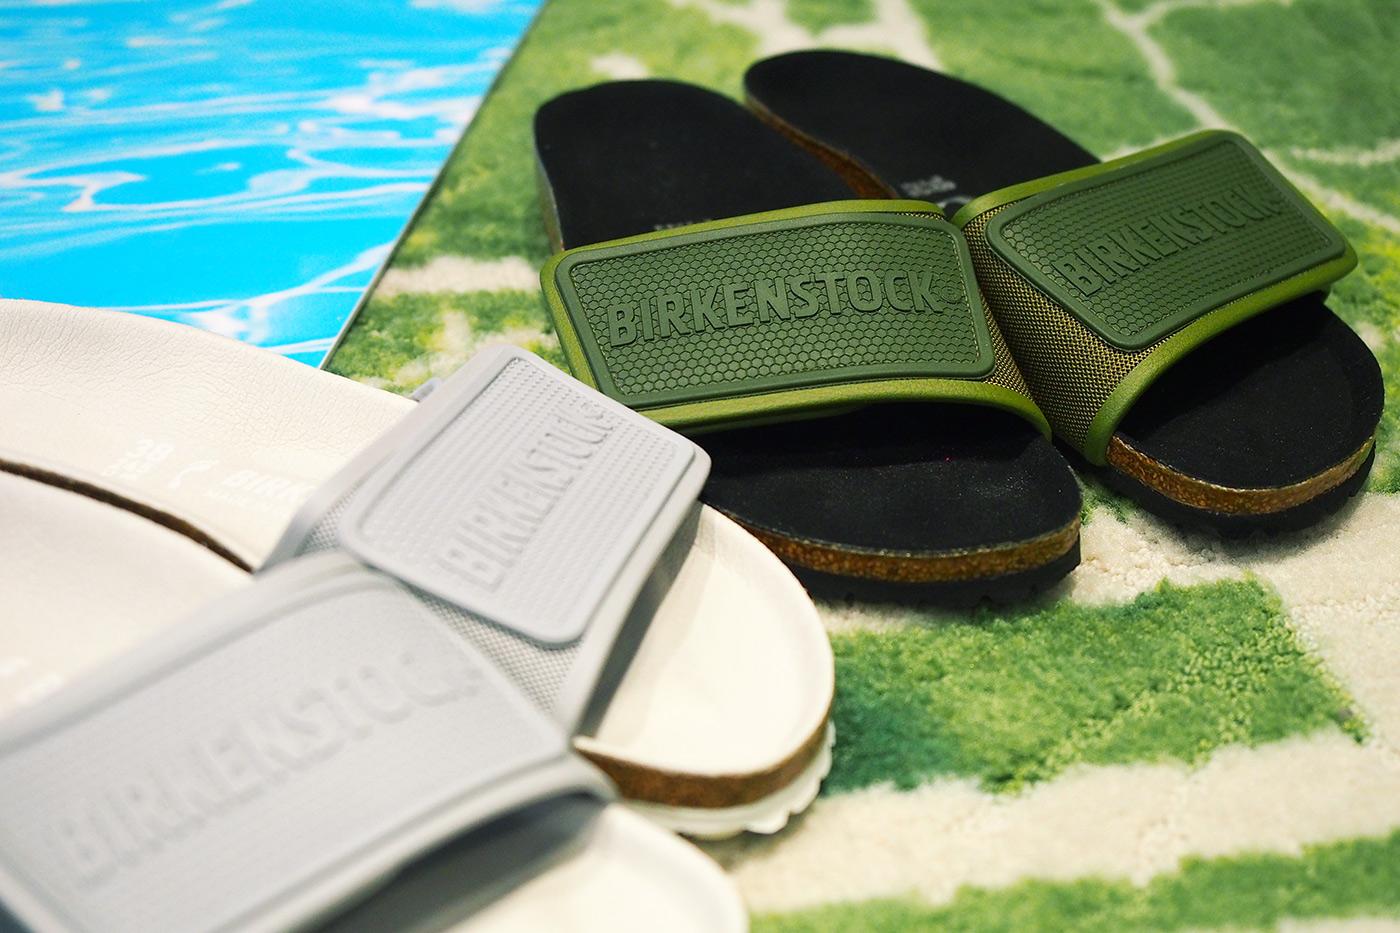 birkesnstock-2019-sandals-02